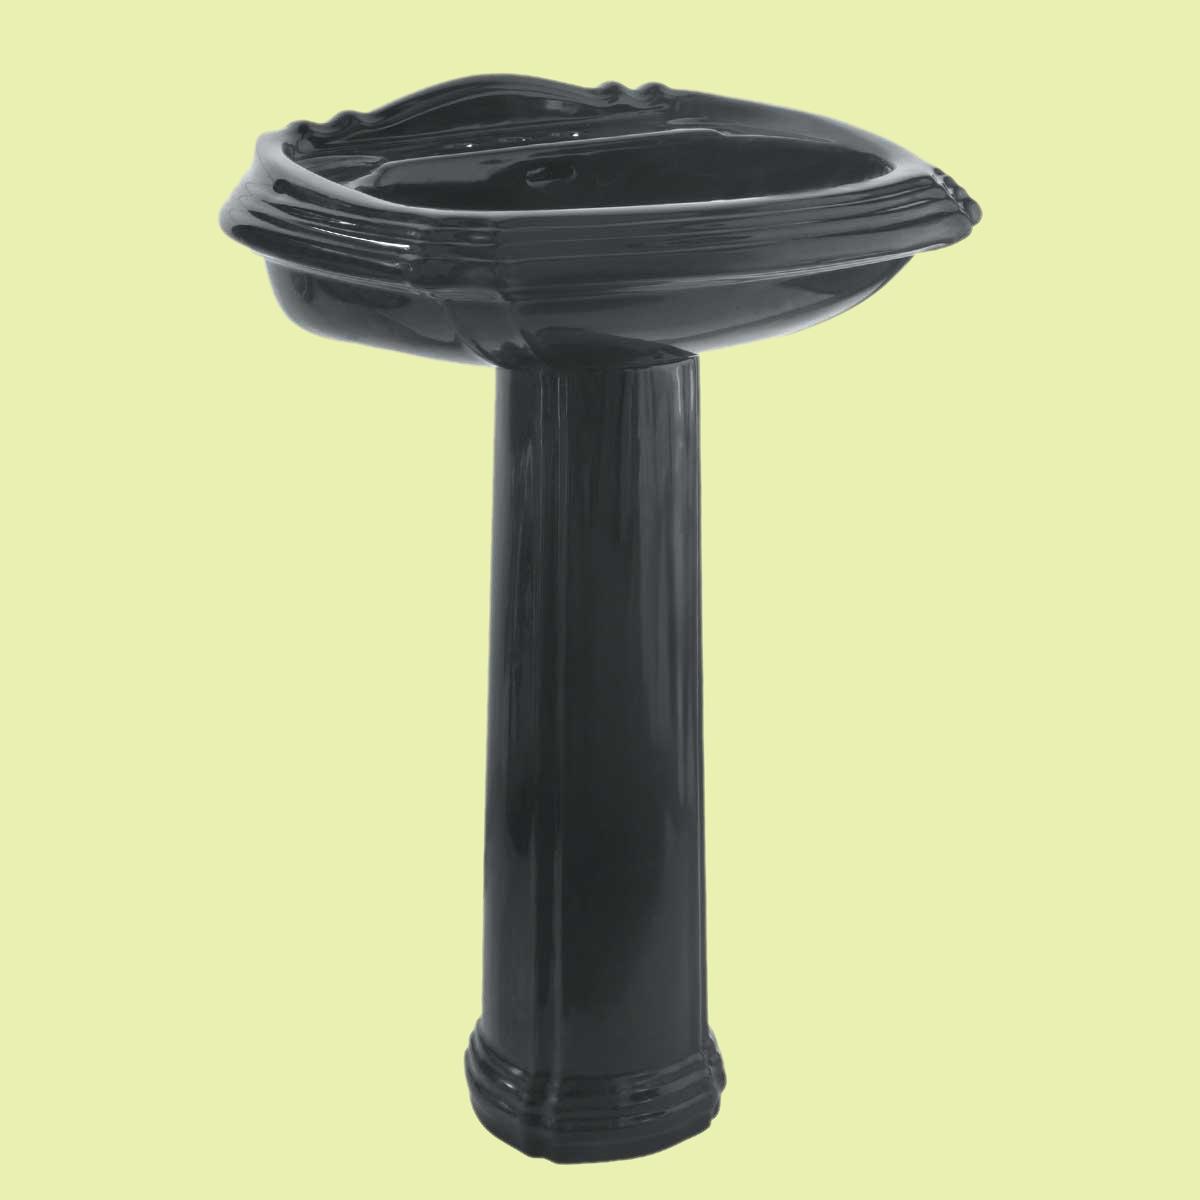 Black Pedestal Sink : Large Black Ornate Pedestal Sink Grade A Vitreous China